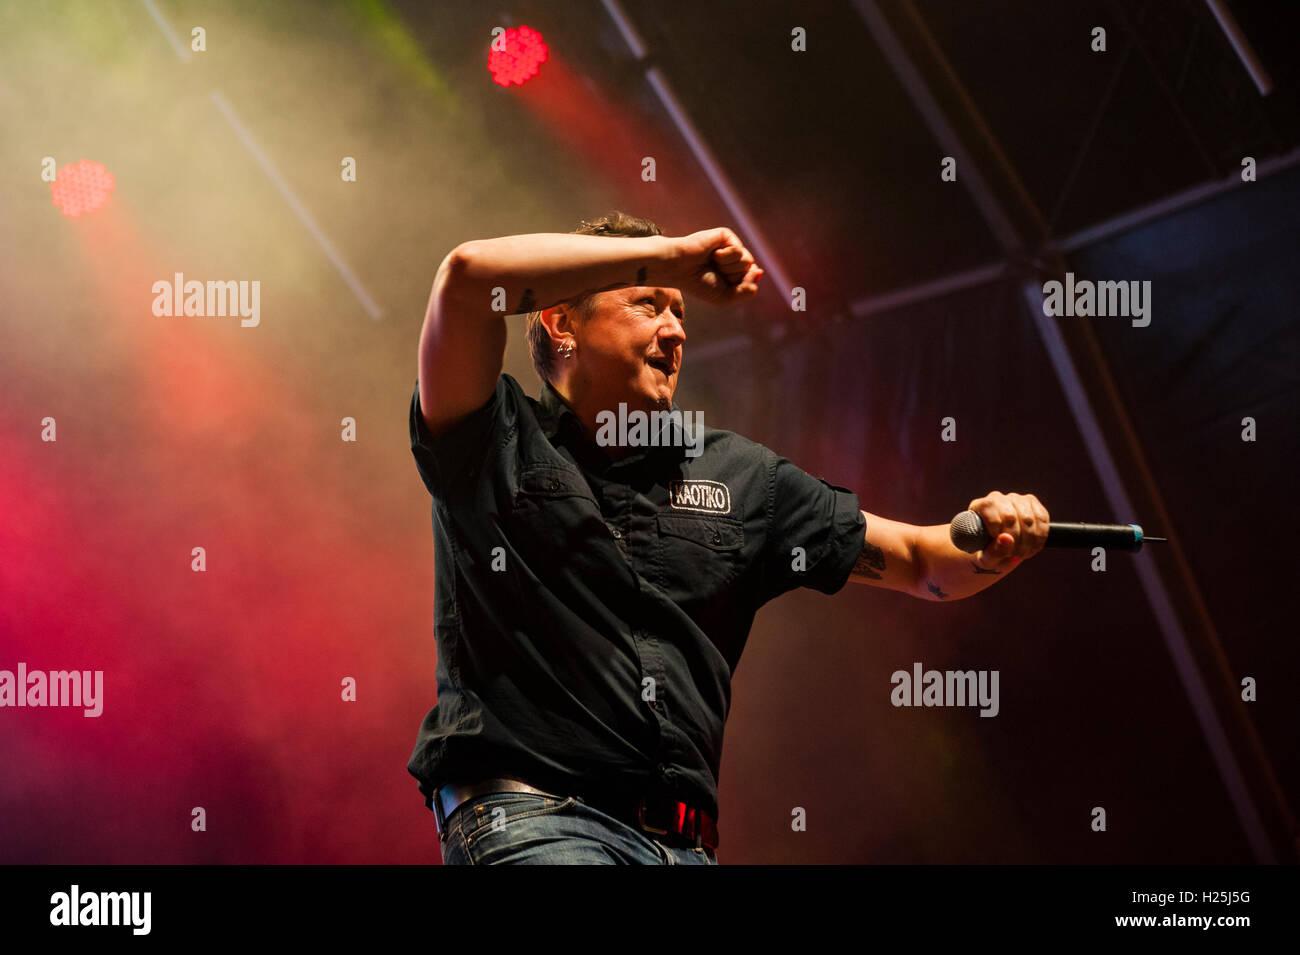 Barcelona,  Spain. 24th September 2016. Fermin Muguruza & Manu Chao performs in concert during day 3 of Festes de Stock Photo